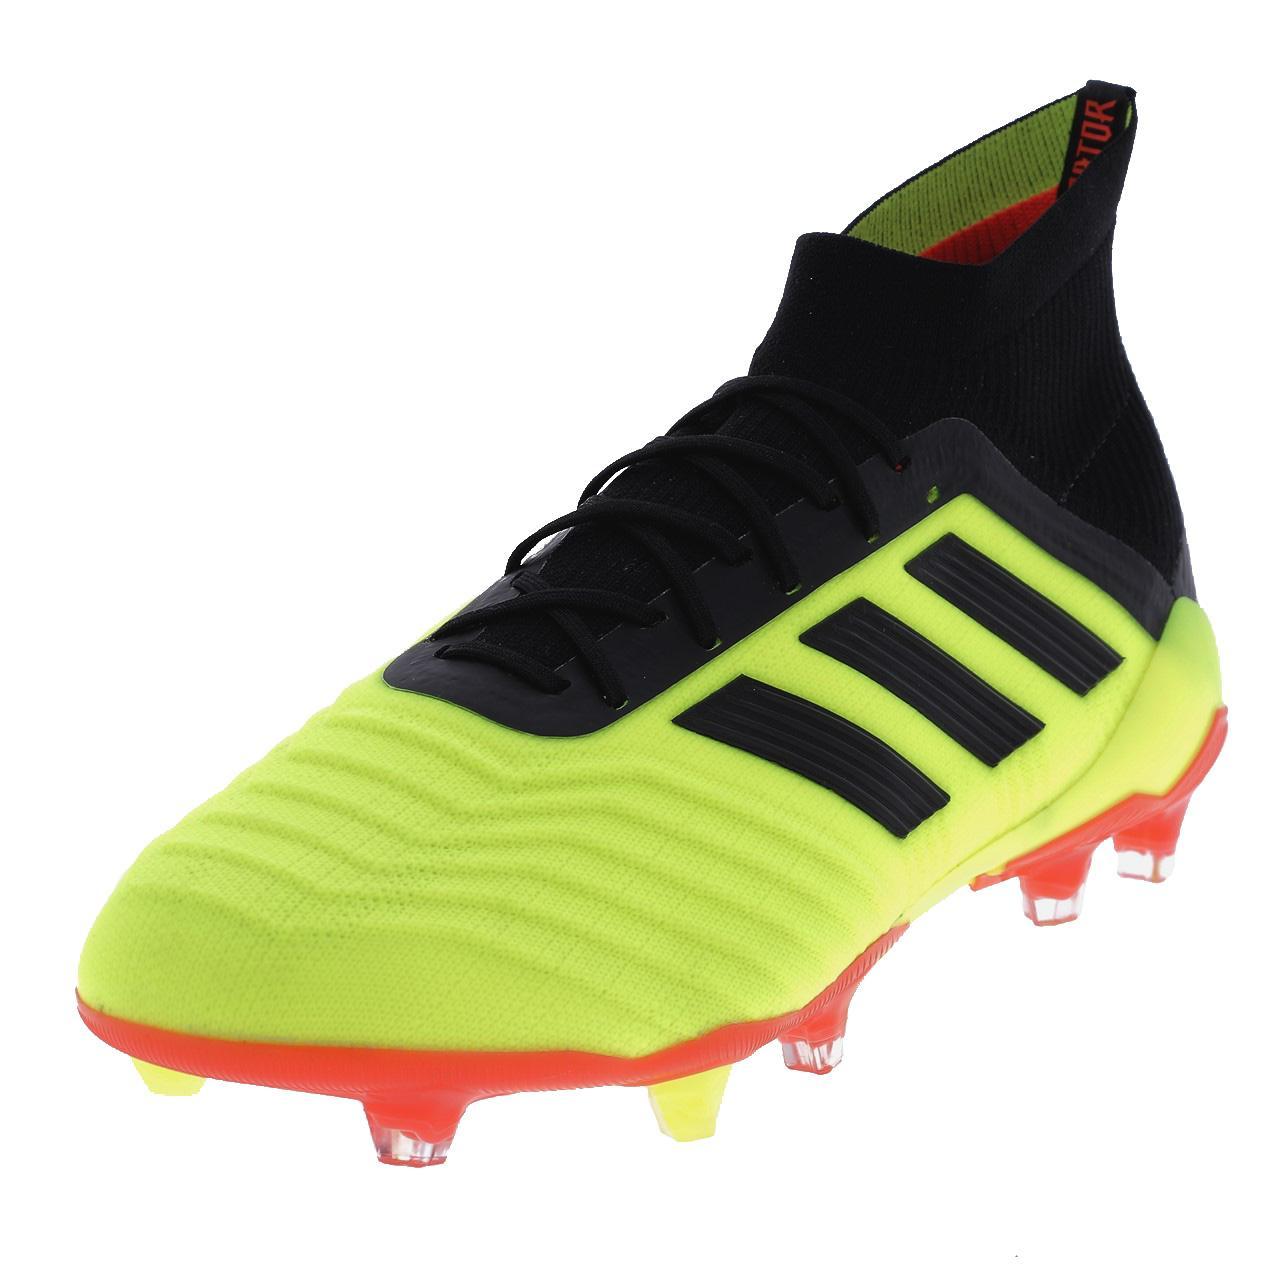 Football-Shoes-Flap-Adidas-Predator-18-1-Fg-Syello-Yellow-47849-New